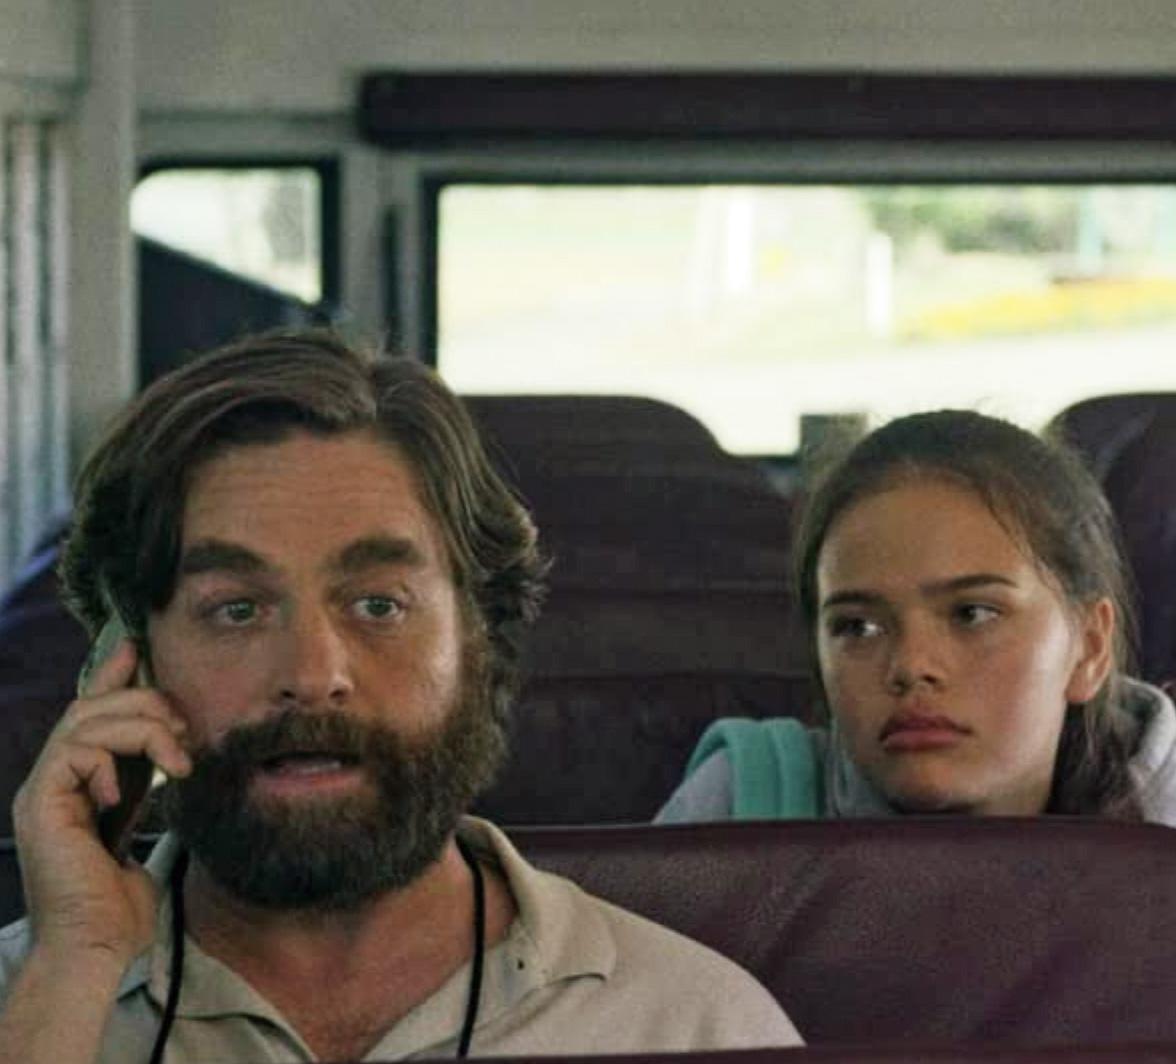 Malia Pyles i Baskets som datteren til Zach Galifianakis (FX)